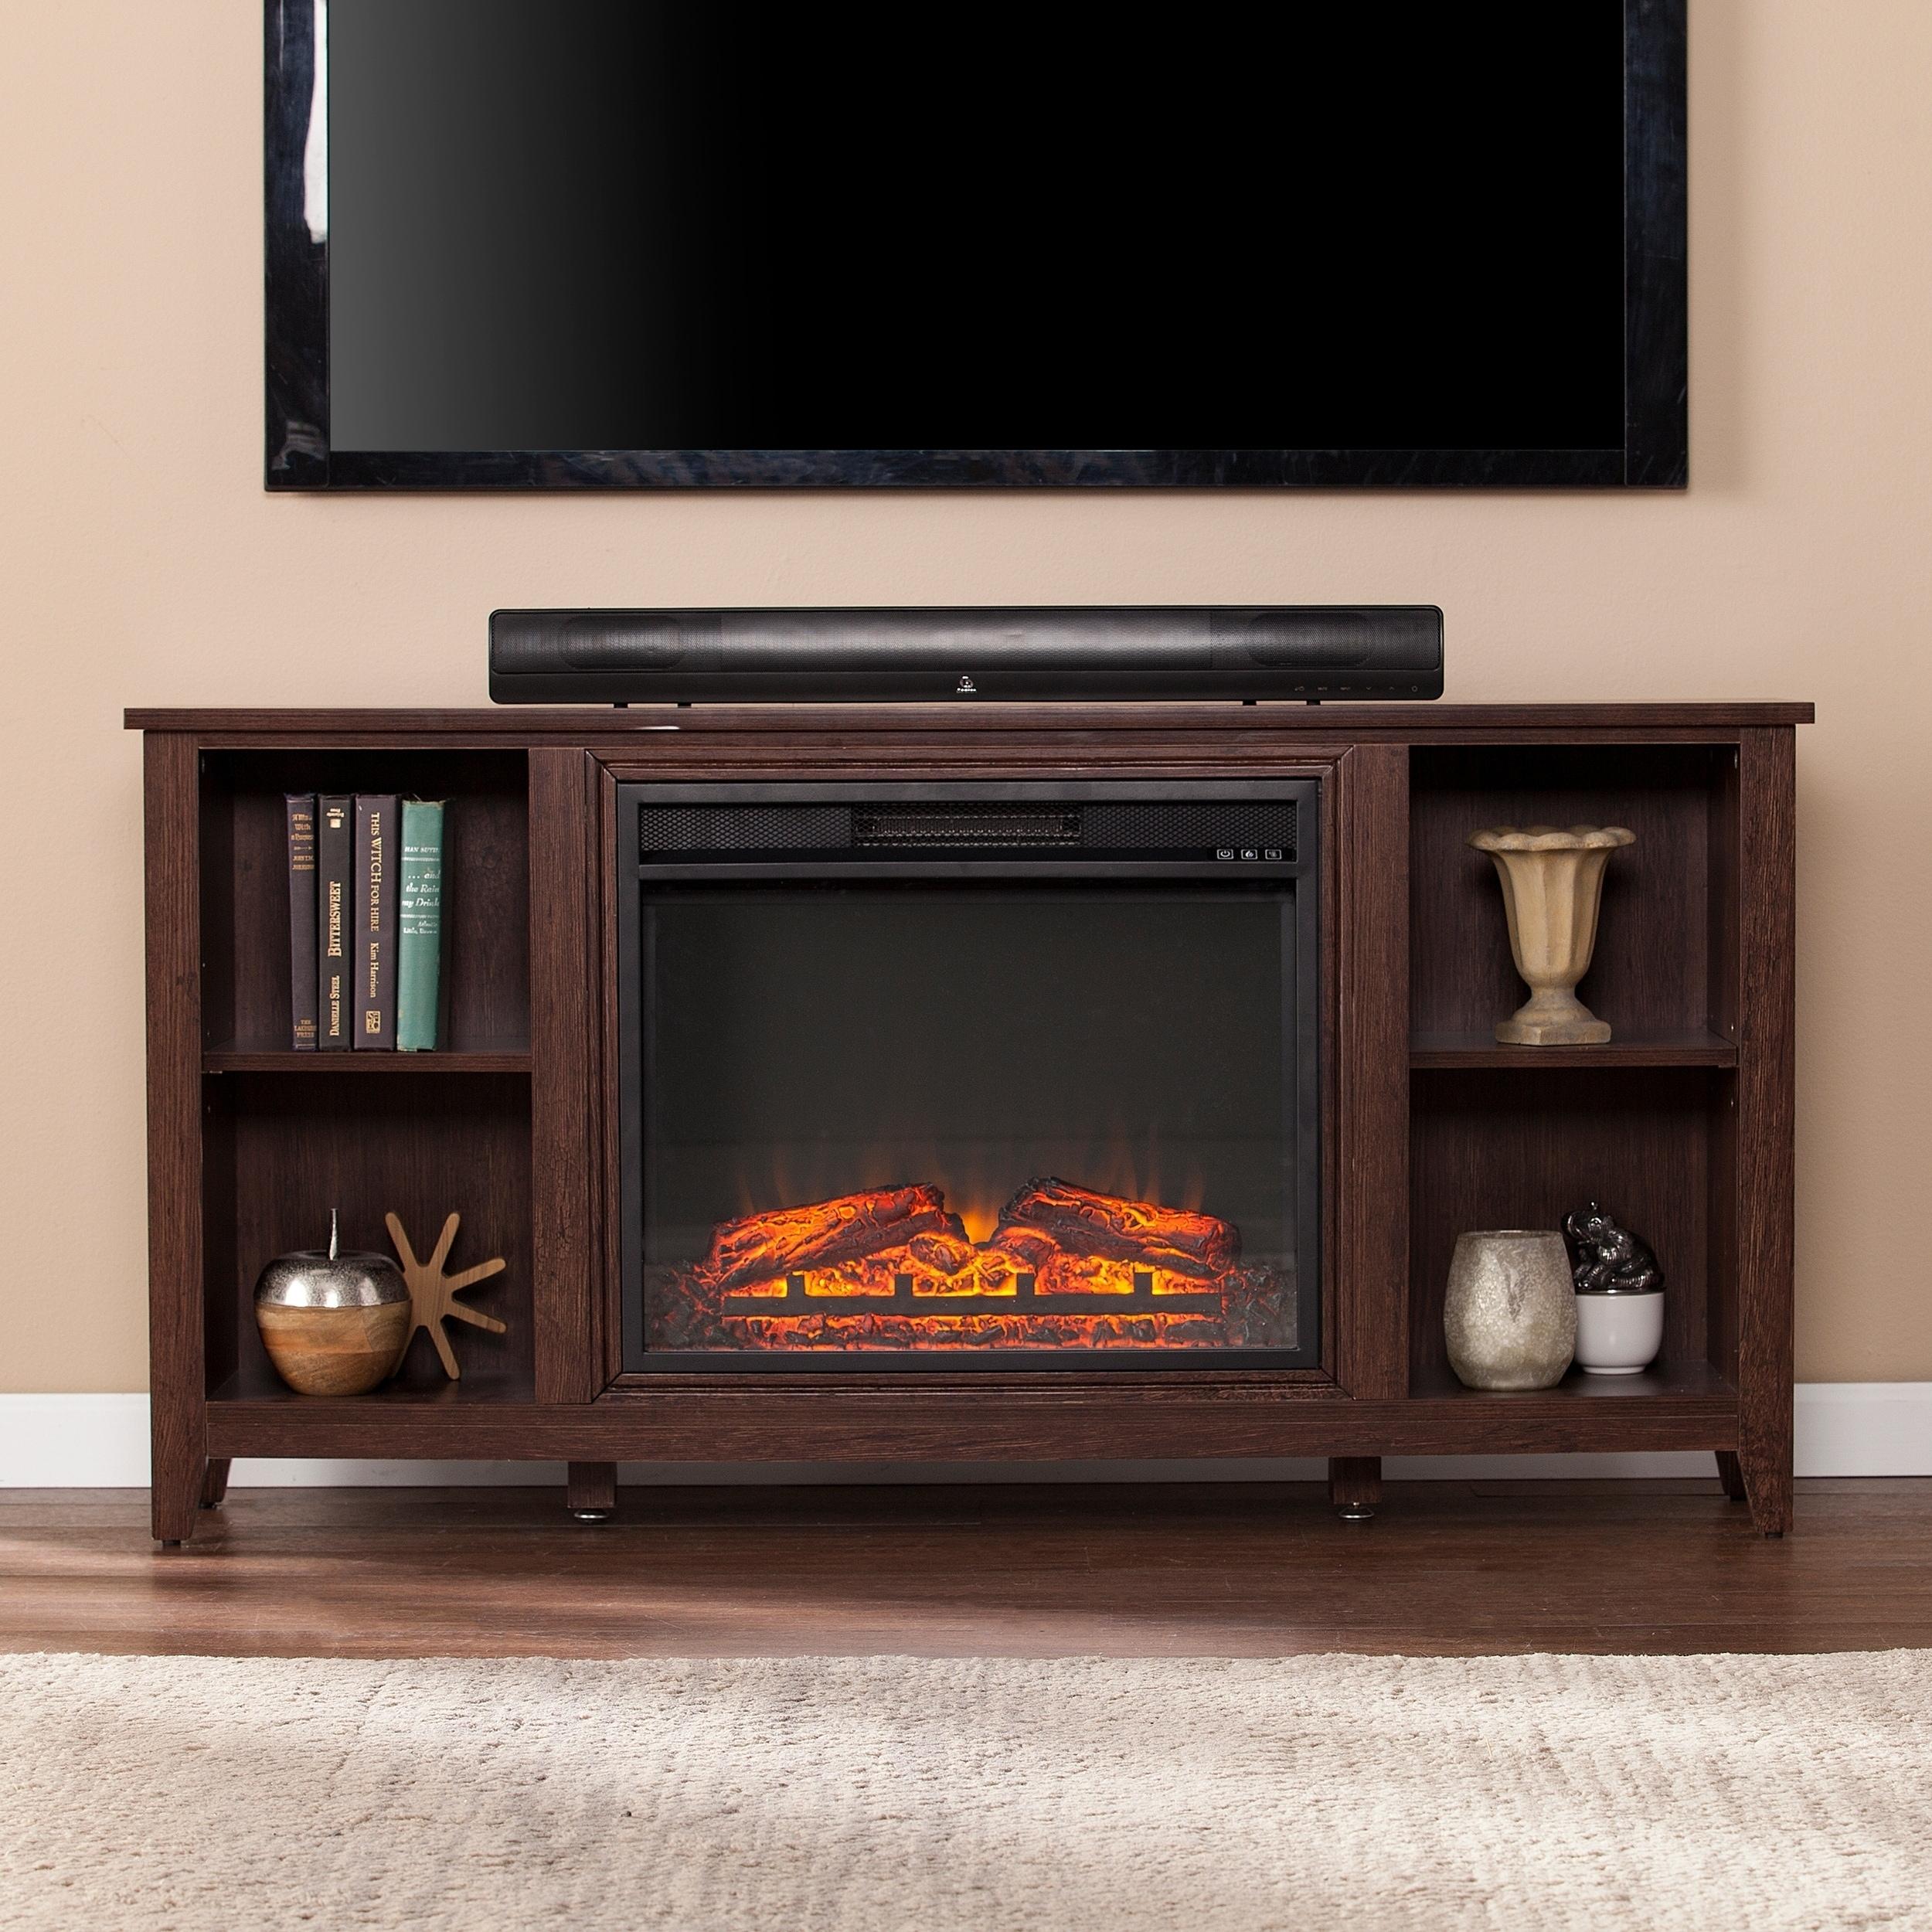 tv oak pressroom las sargent lasvegas summer with electric stand media fireplace center